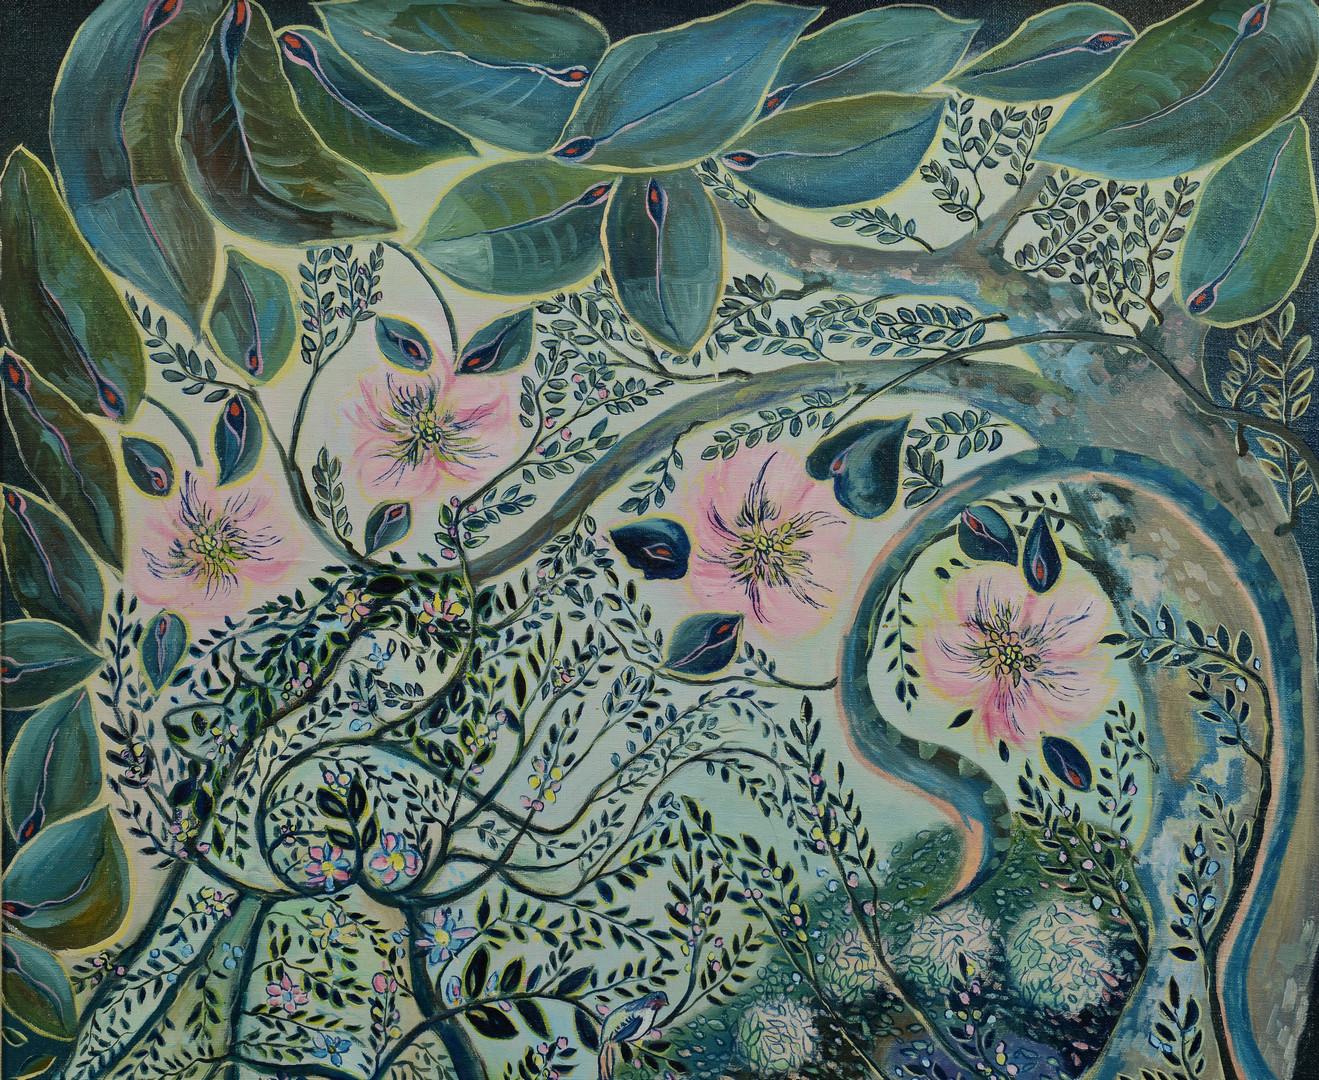 Lot 190: Paul Lancaster, Eve in the Garden